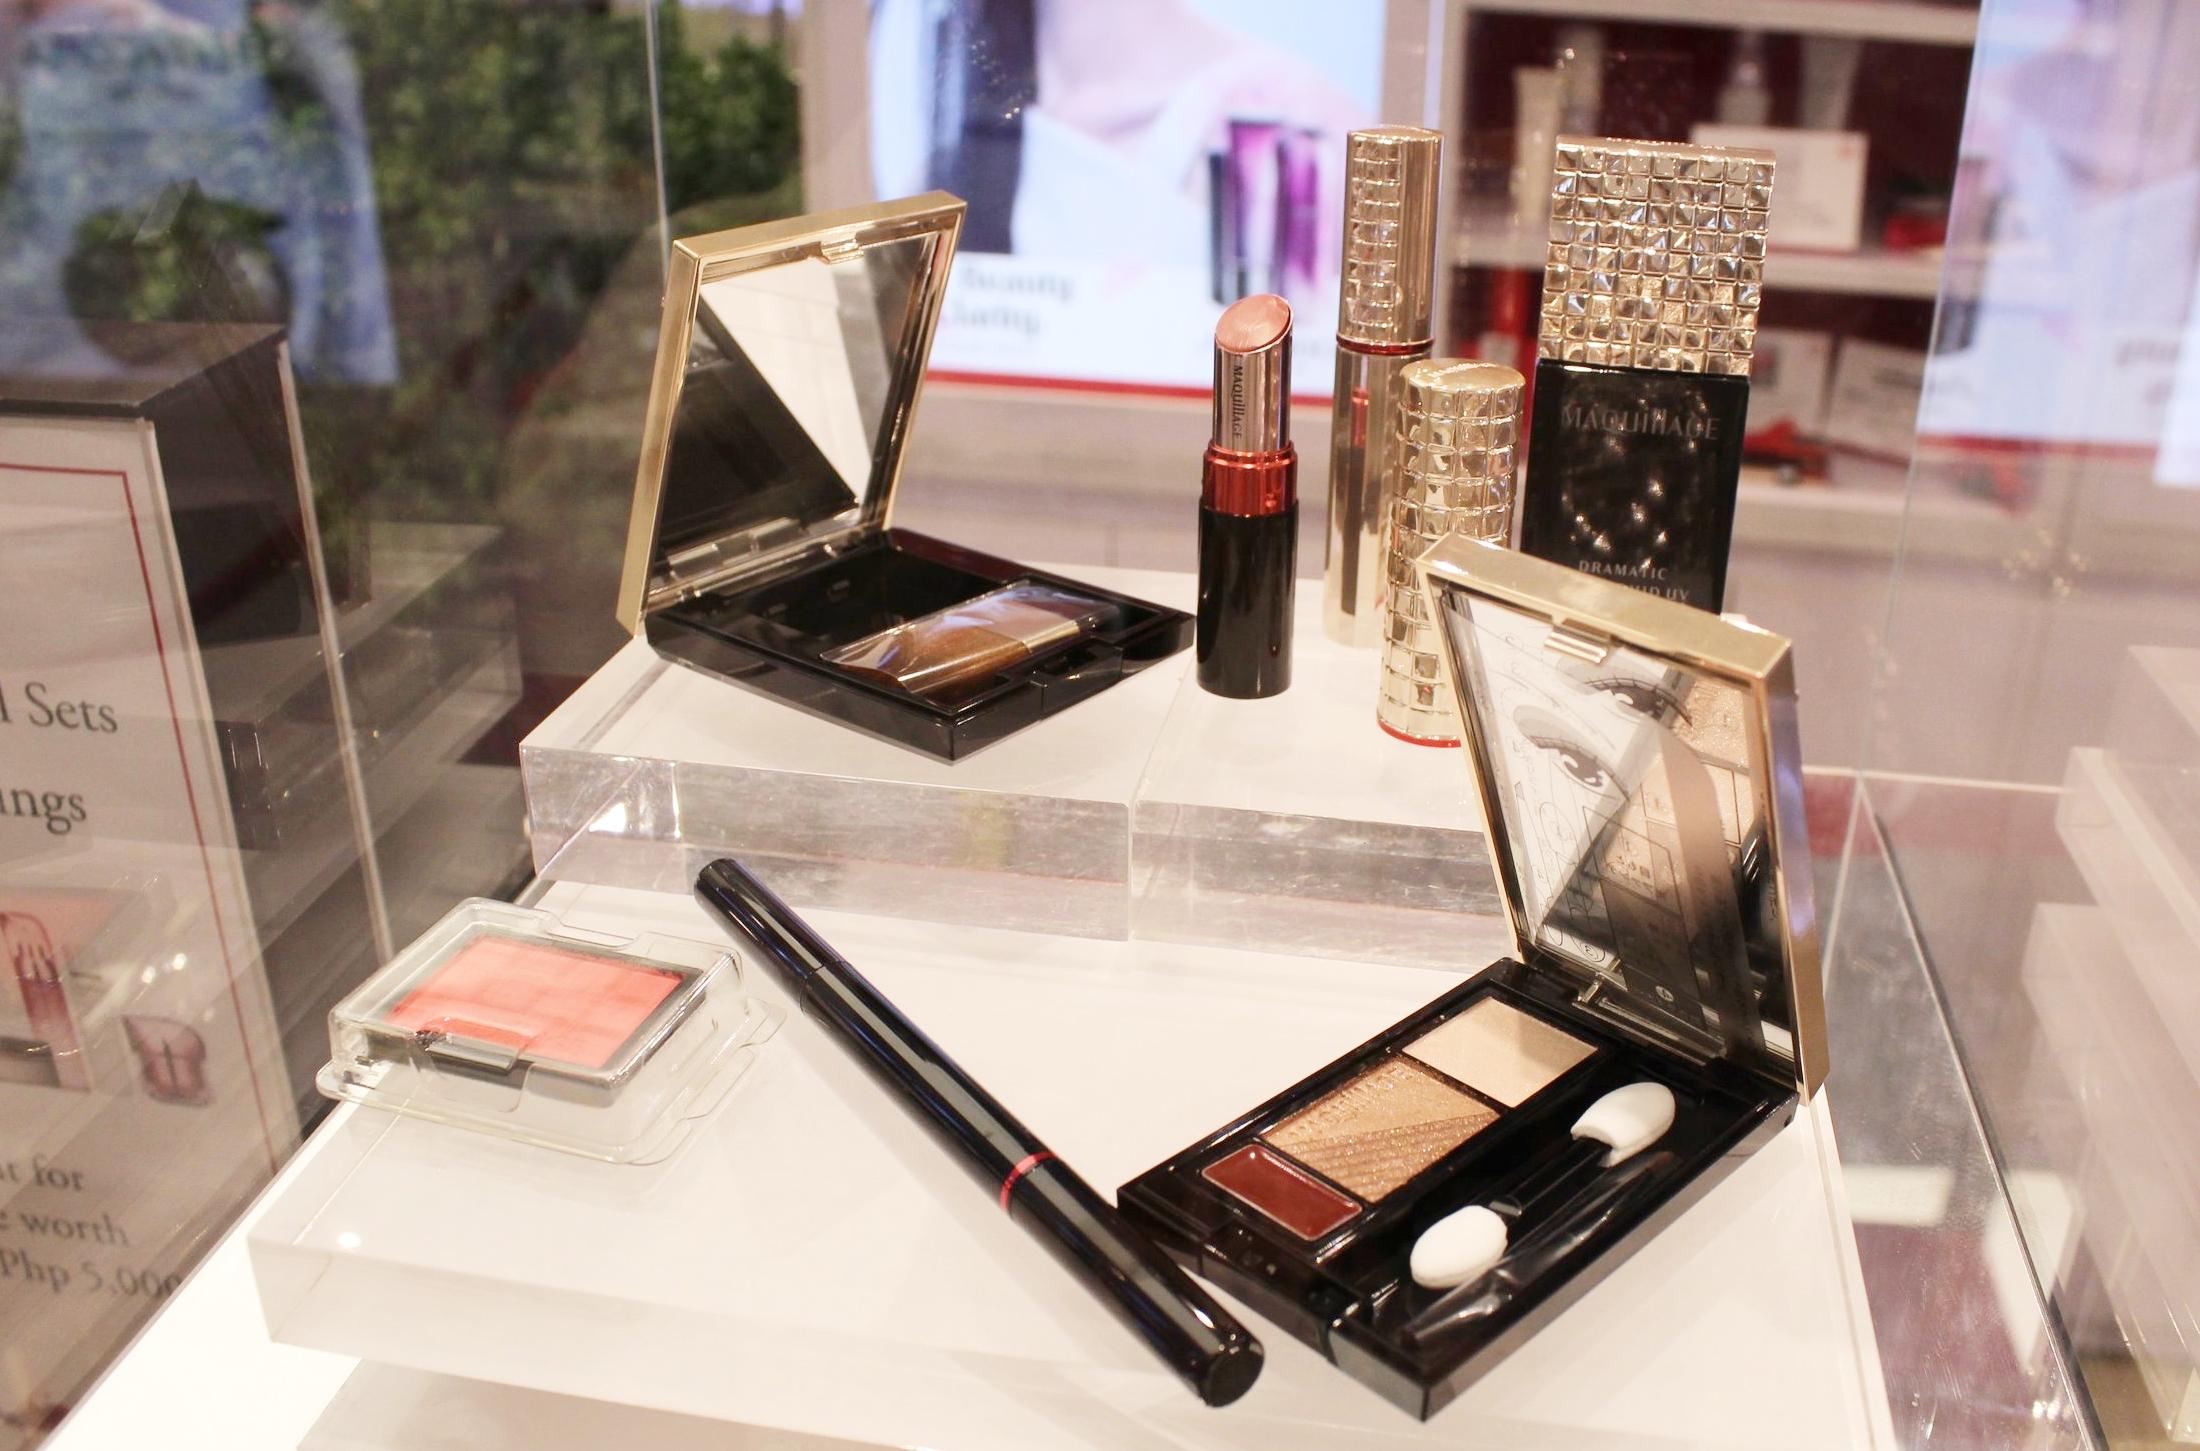 Maquillage_Shisedo display.jpg